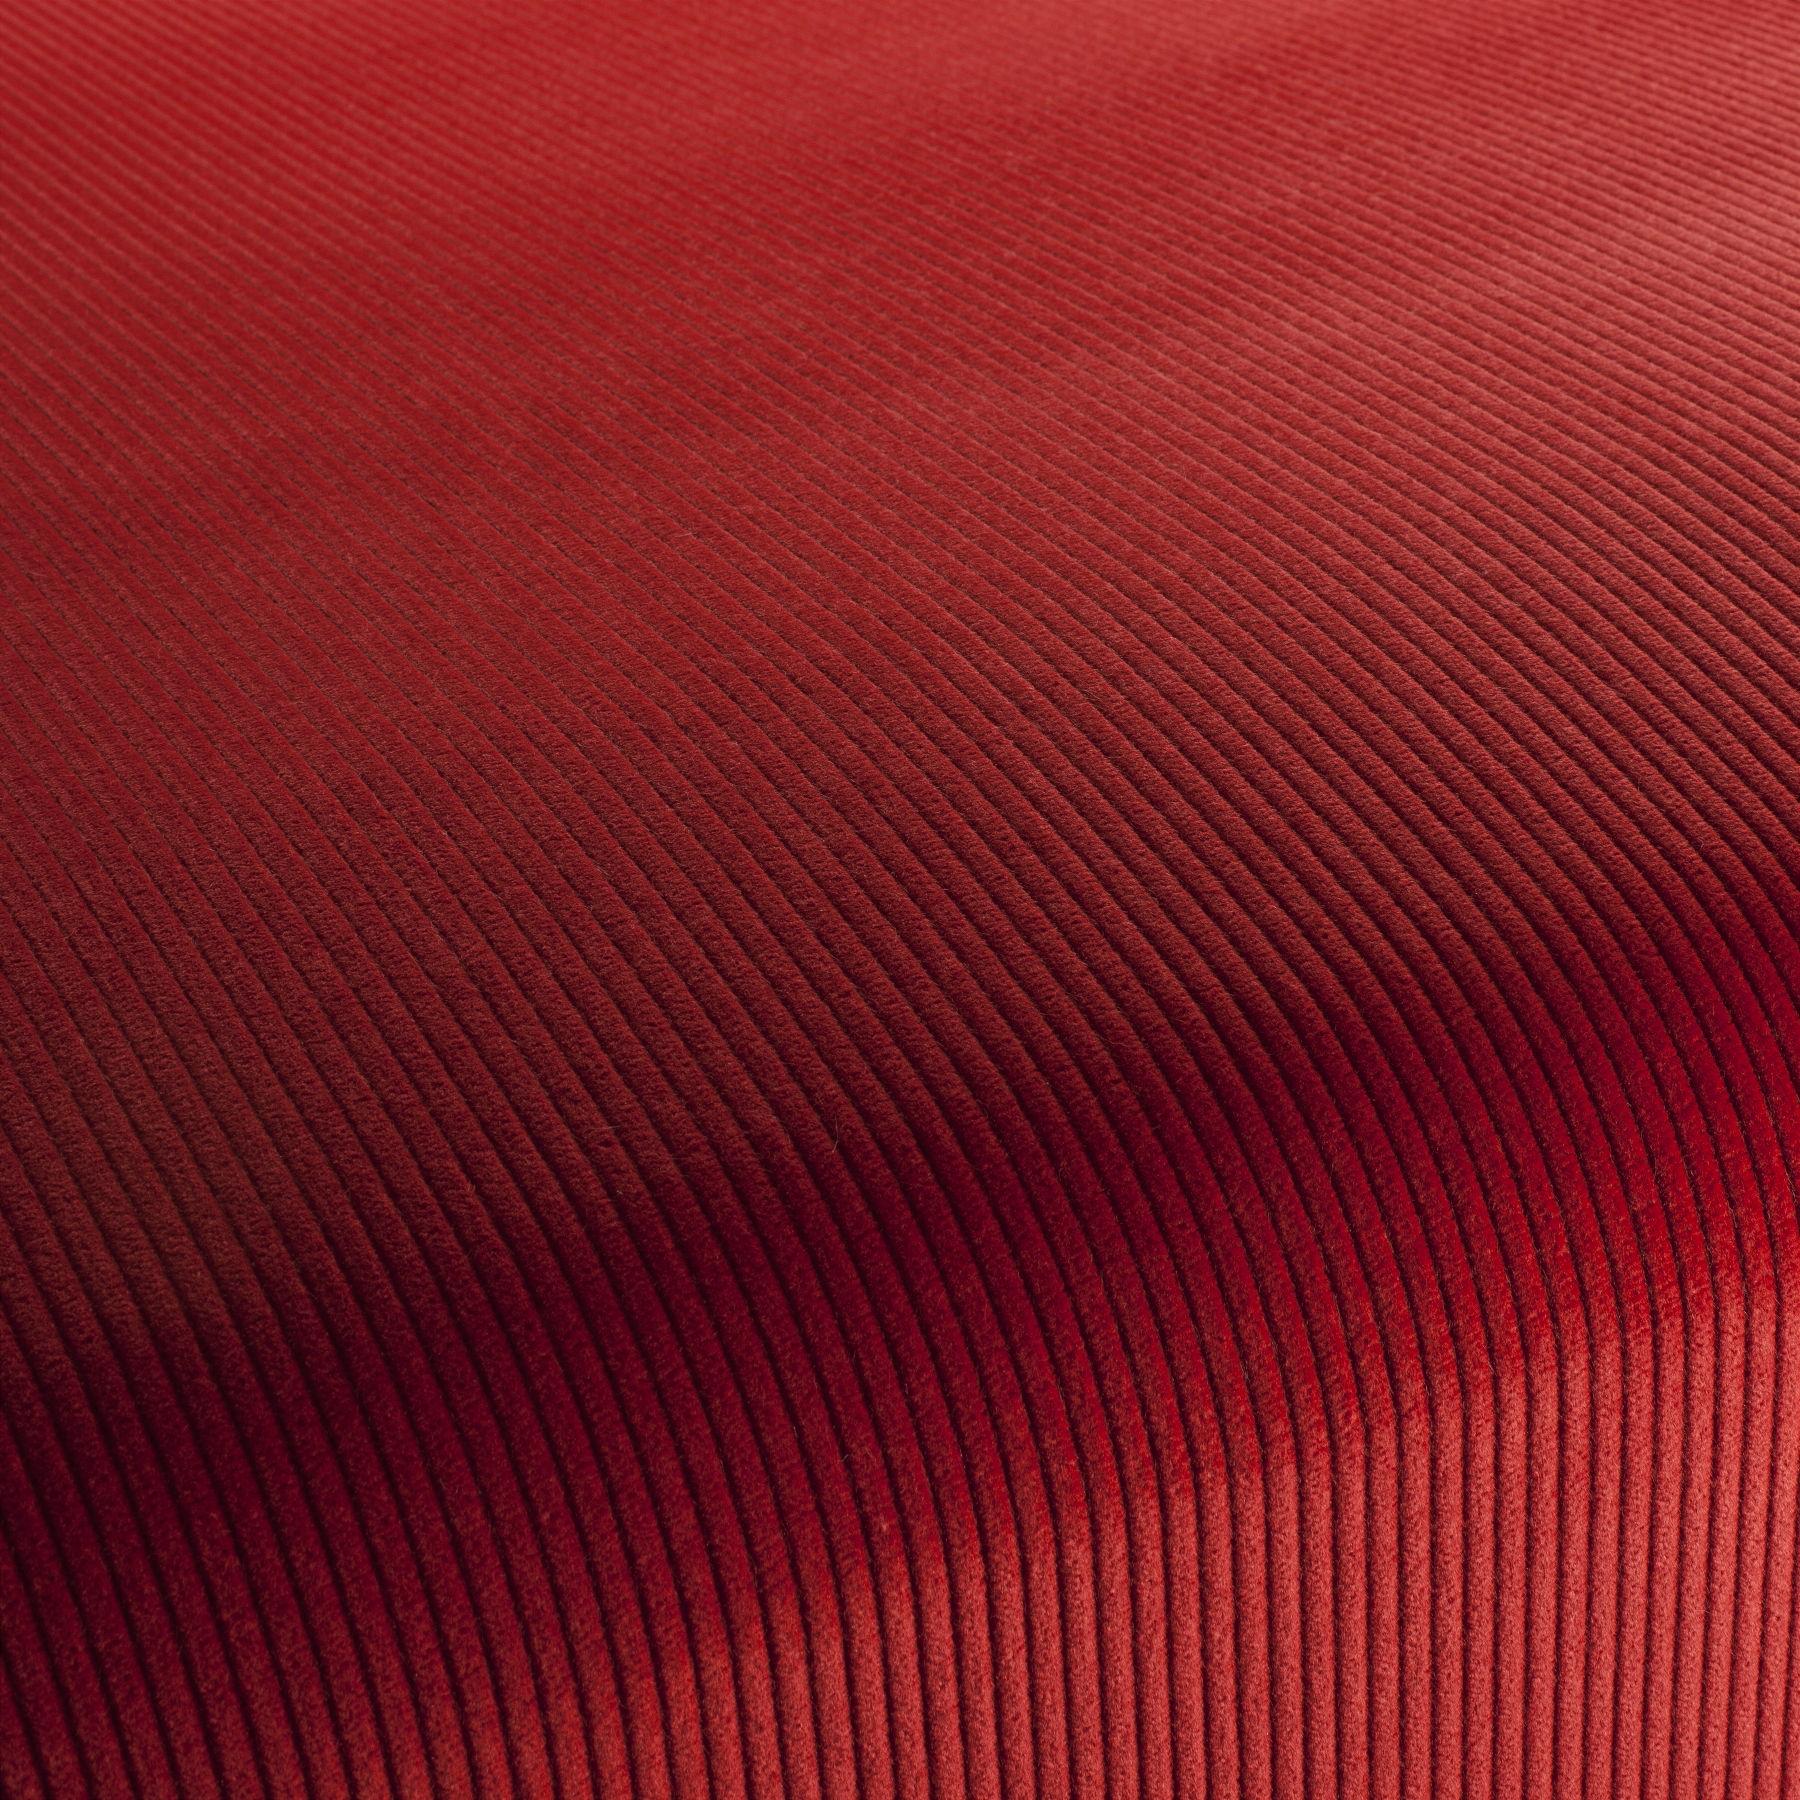 upholstery fabric cord 1 3126 011 jab anstoetz. Black Bedroom Furniture Sets. Home Design Ideas